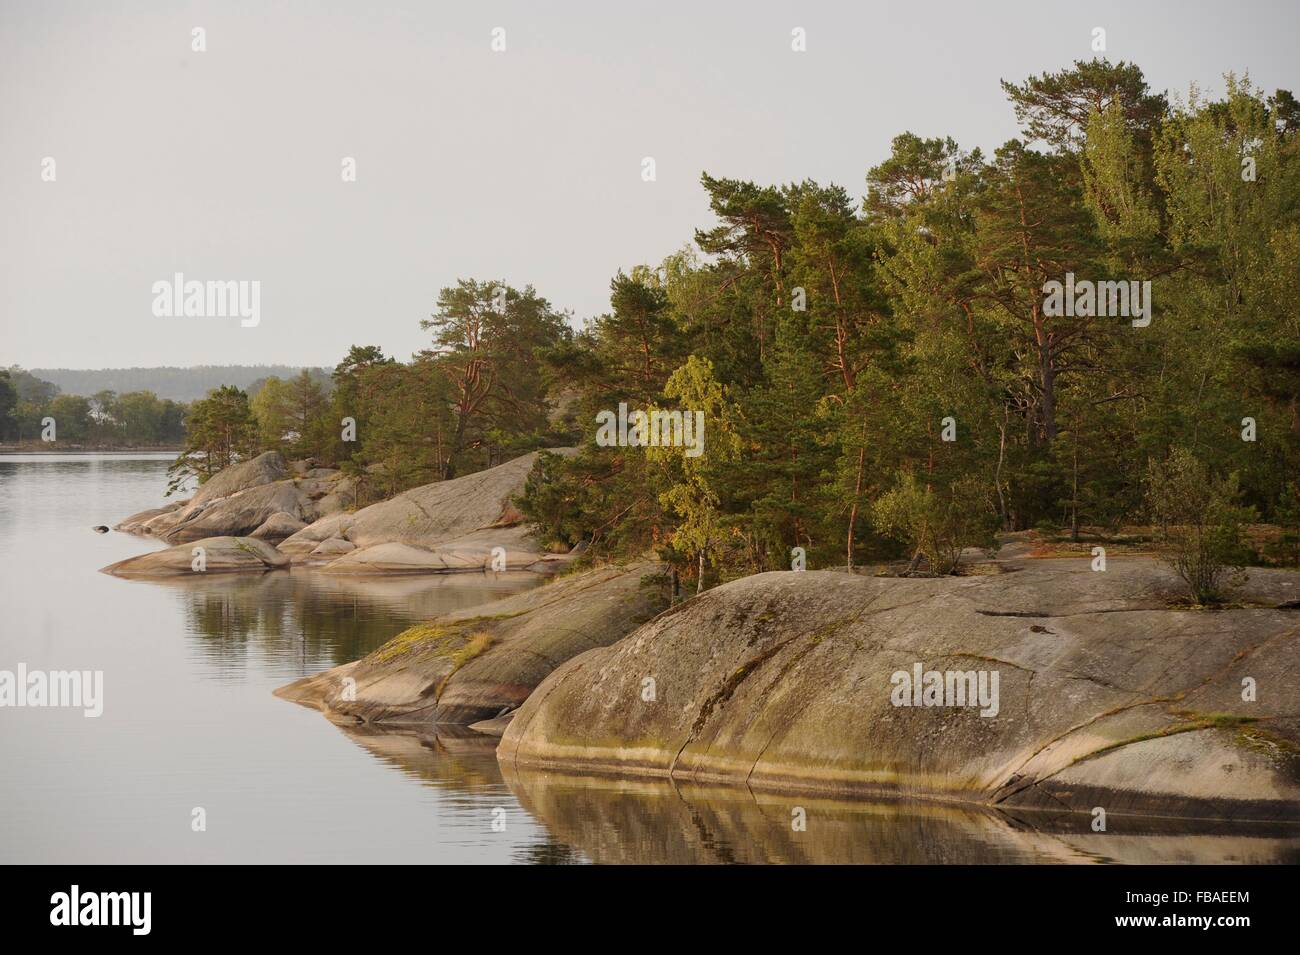 coast of the Stockholm Archipelago, Sweden - Stock Image